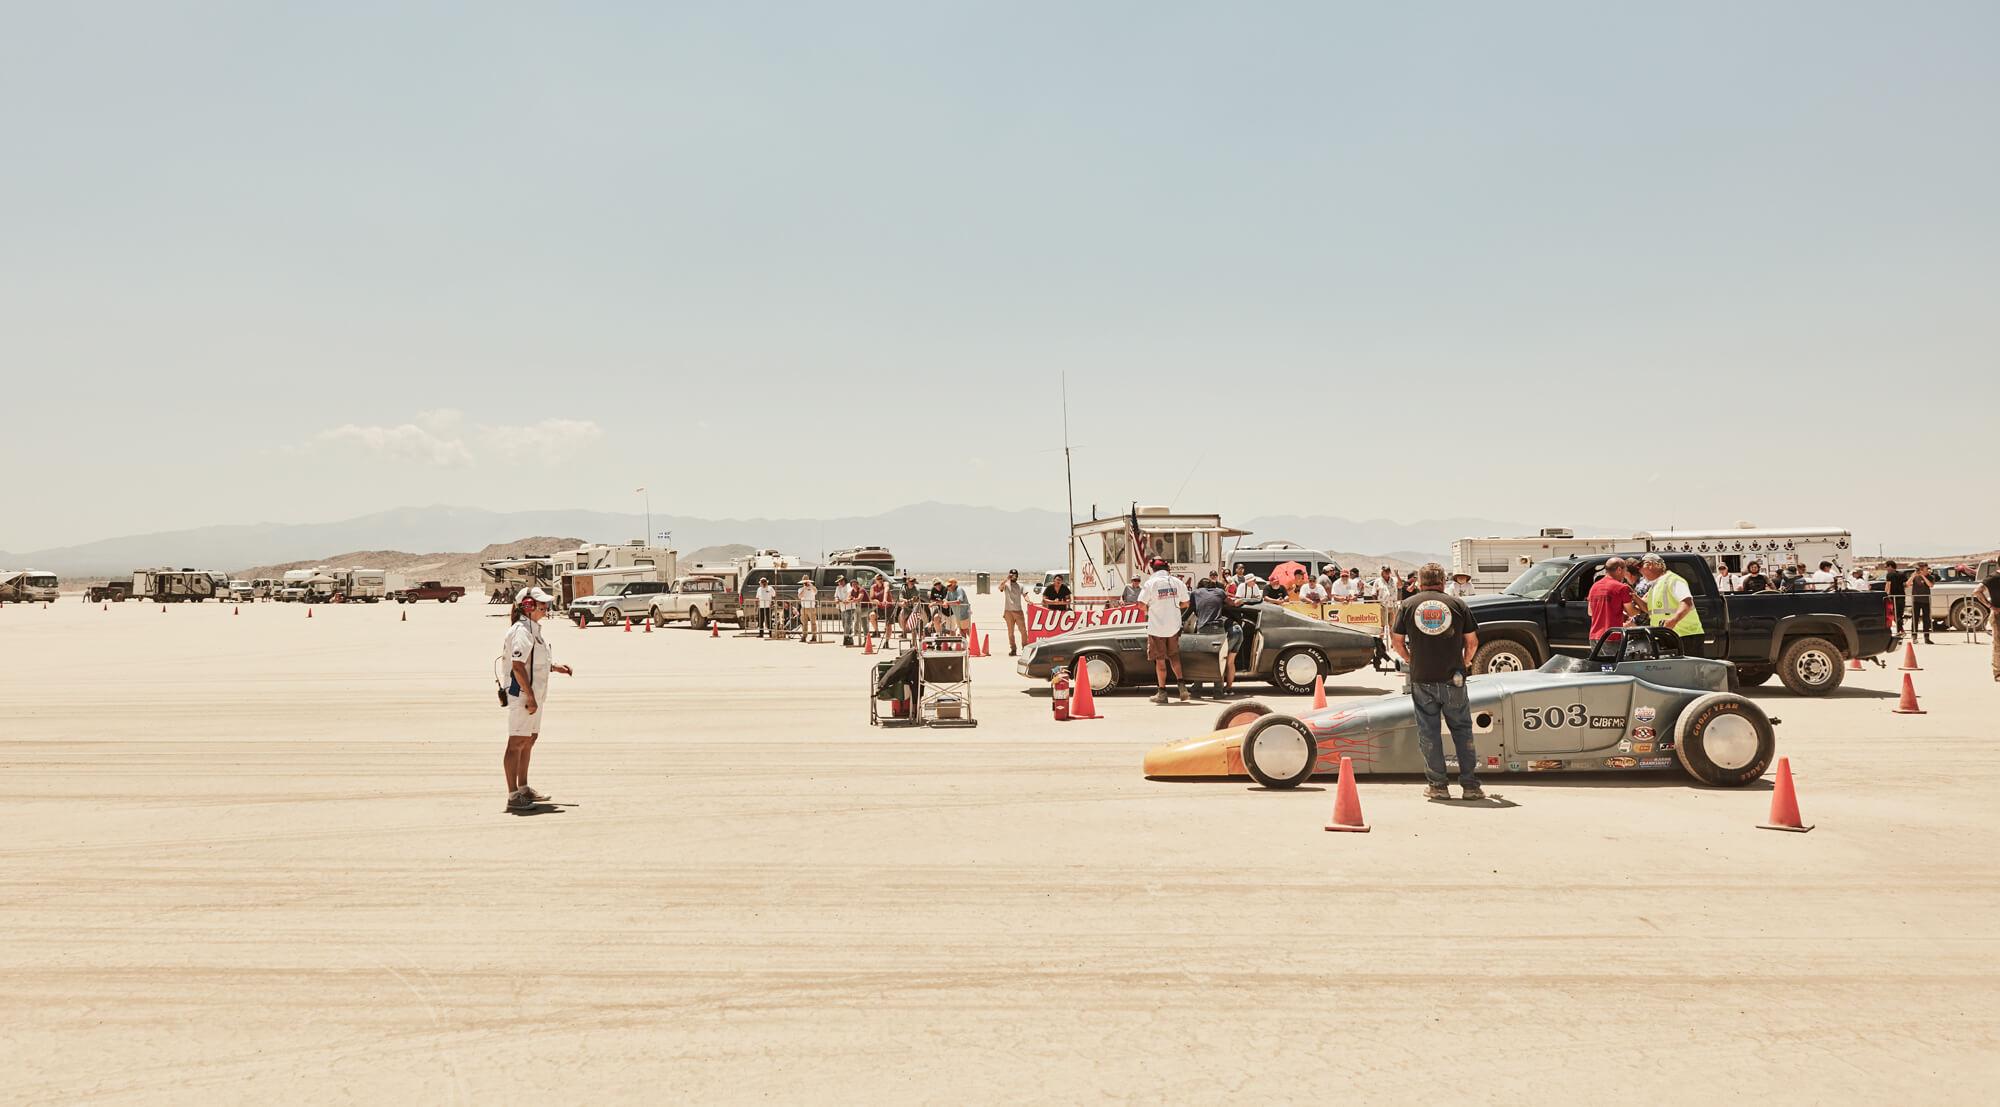 Unified Content, Unified Content Toronto, Aaron Cobb, Desert, Racing, Dust, Desert Racing, Cart racing, El Mirage, Arizona, gyrocopter, ultralight aircraft operations, automobile racing, photography, action photography, action shot